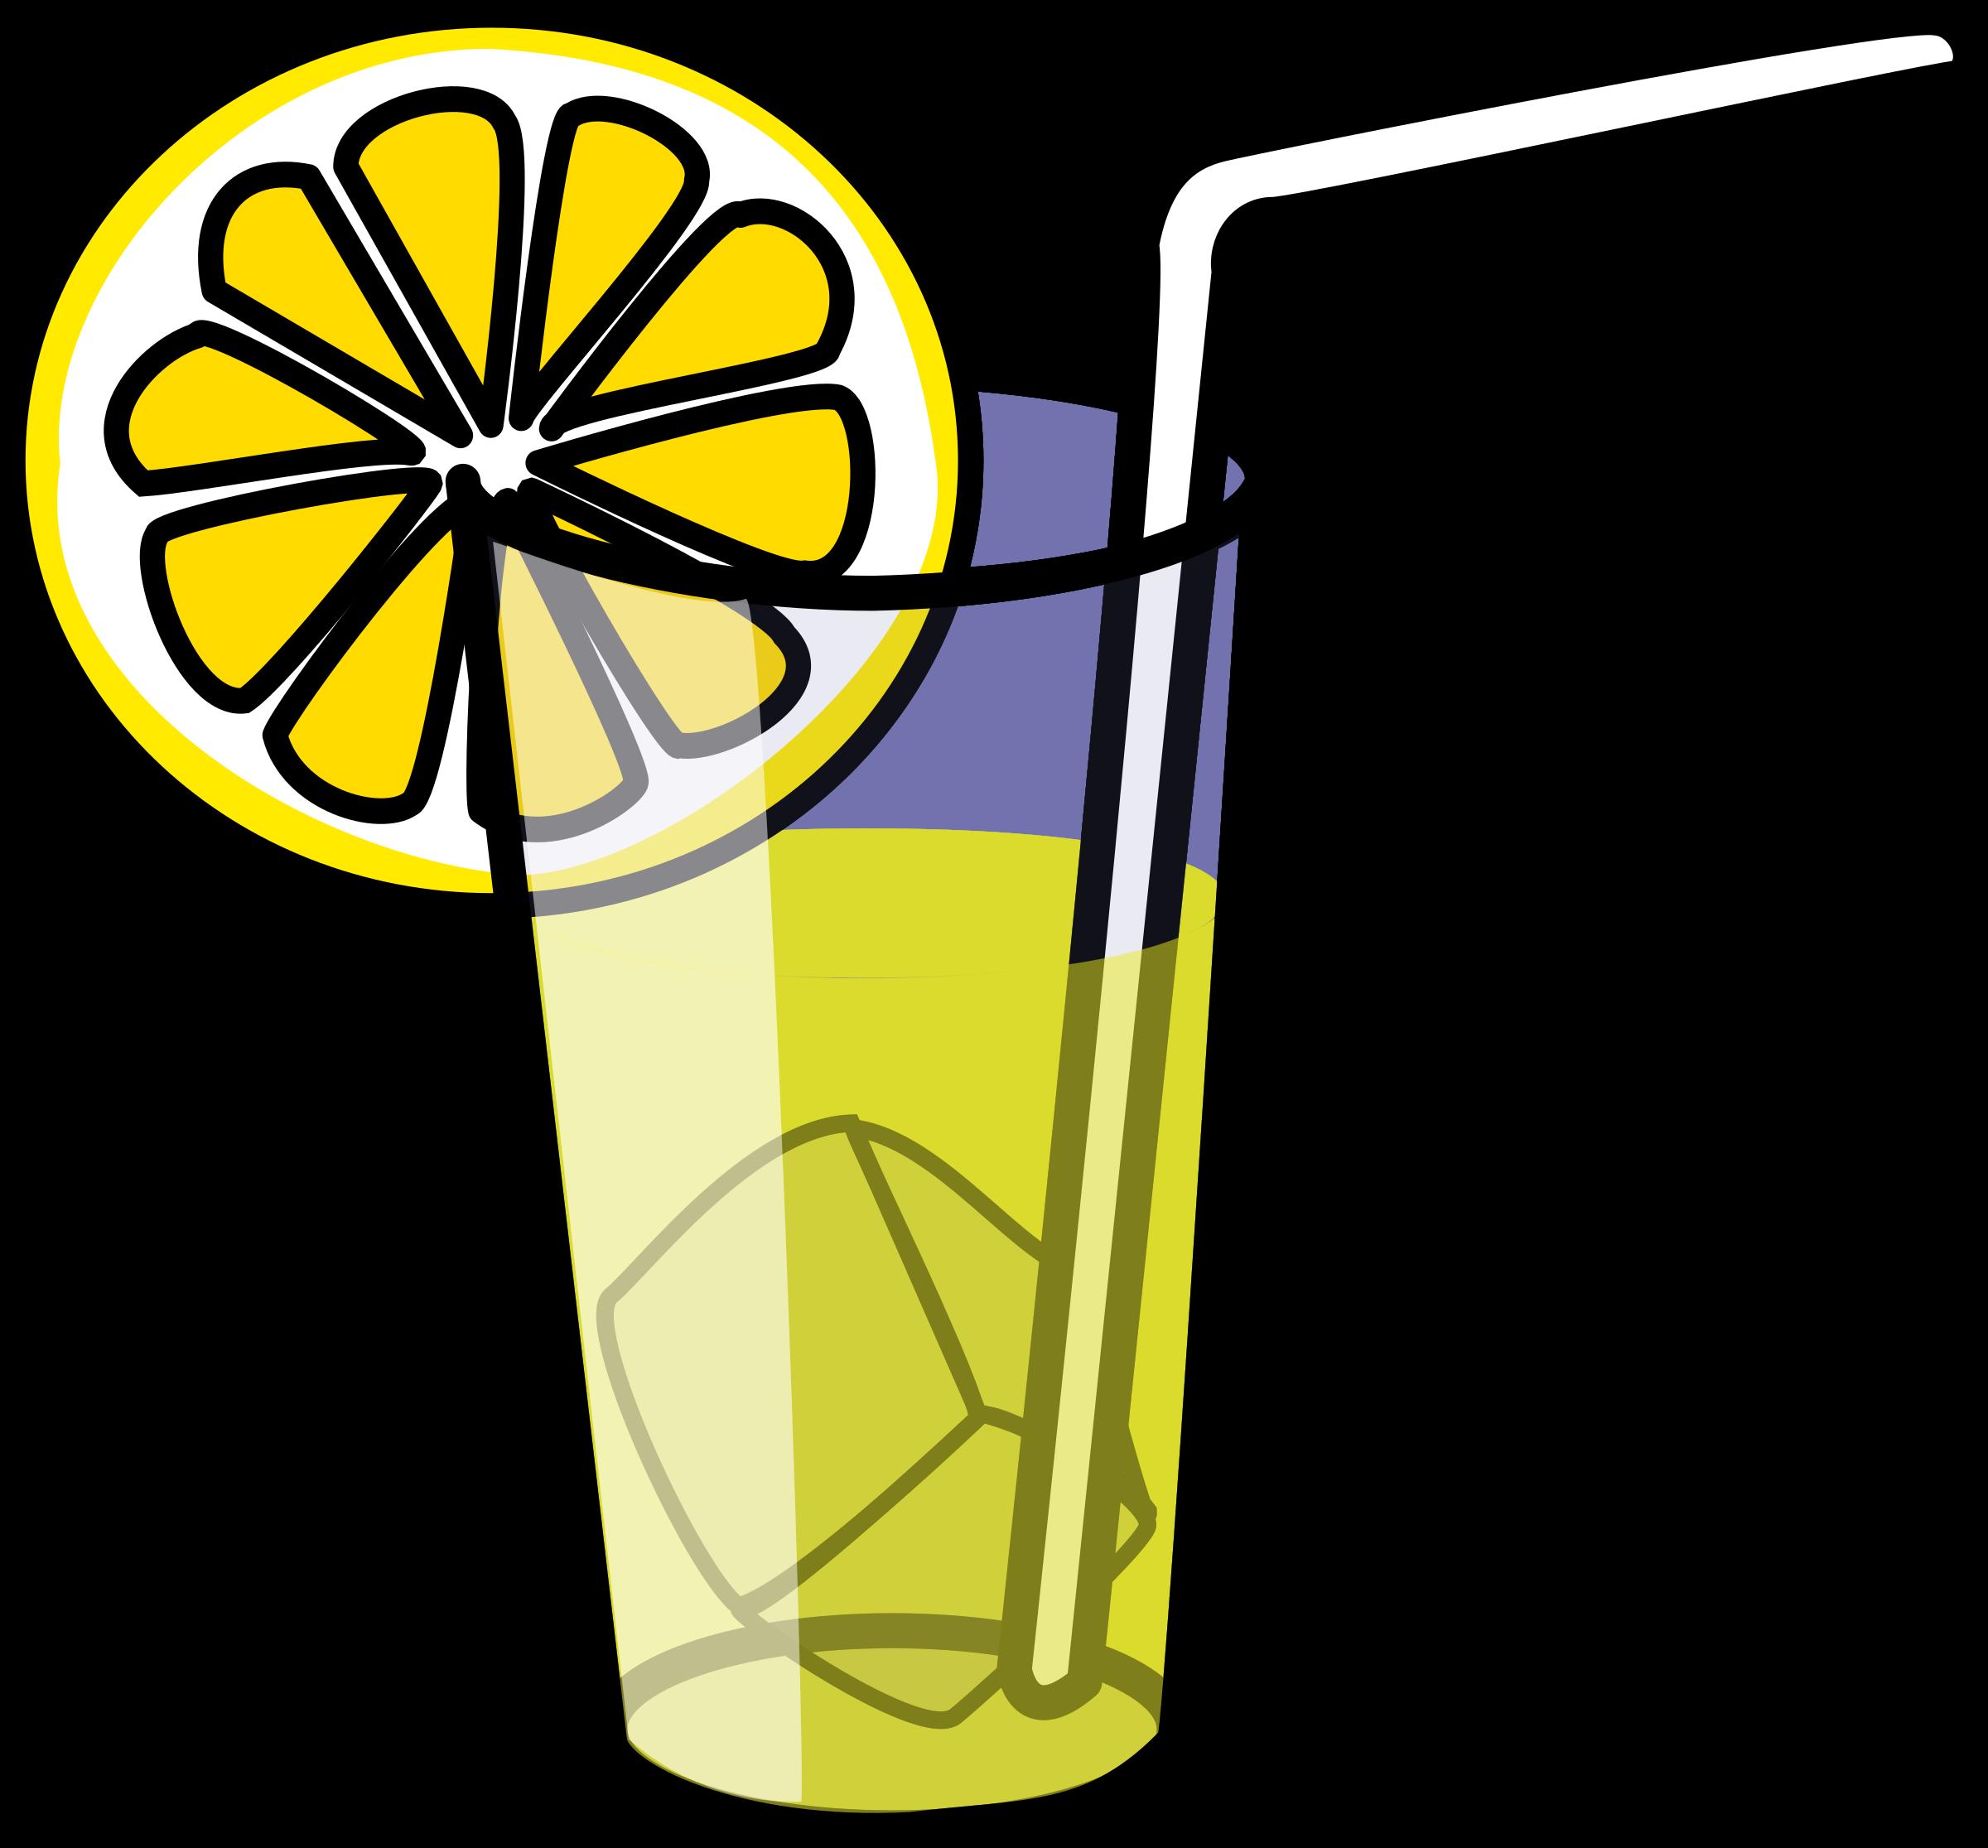 Drink clipart welcome drink. Lemonade glass by nicubunu